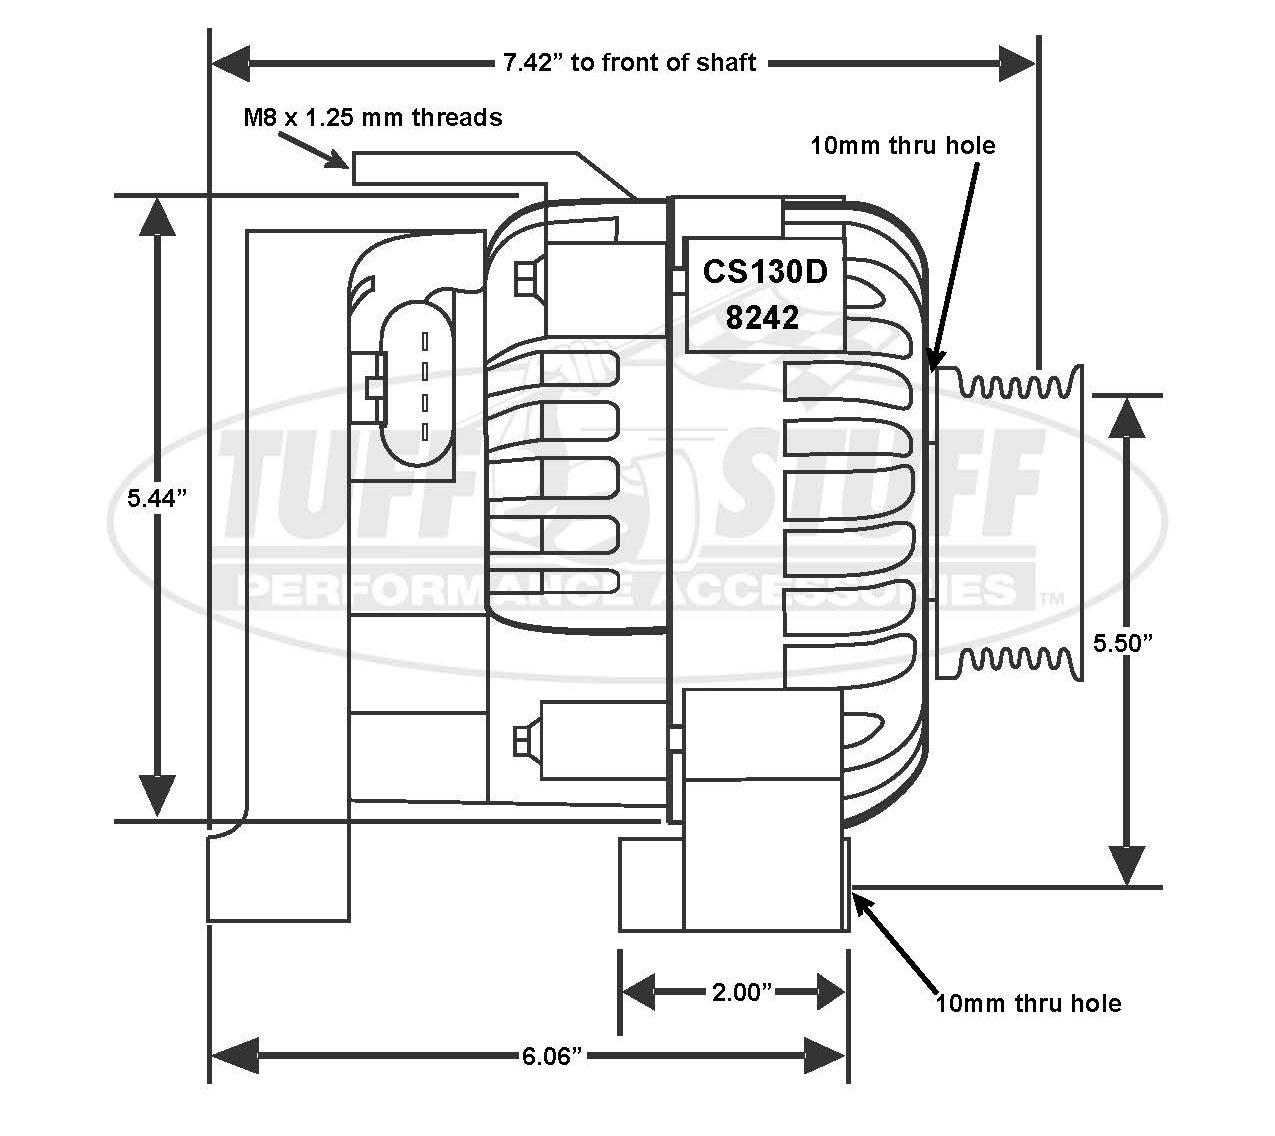 Chevrolet Ls1 175 Amp Alternator 6 Groove Pulley Polished